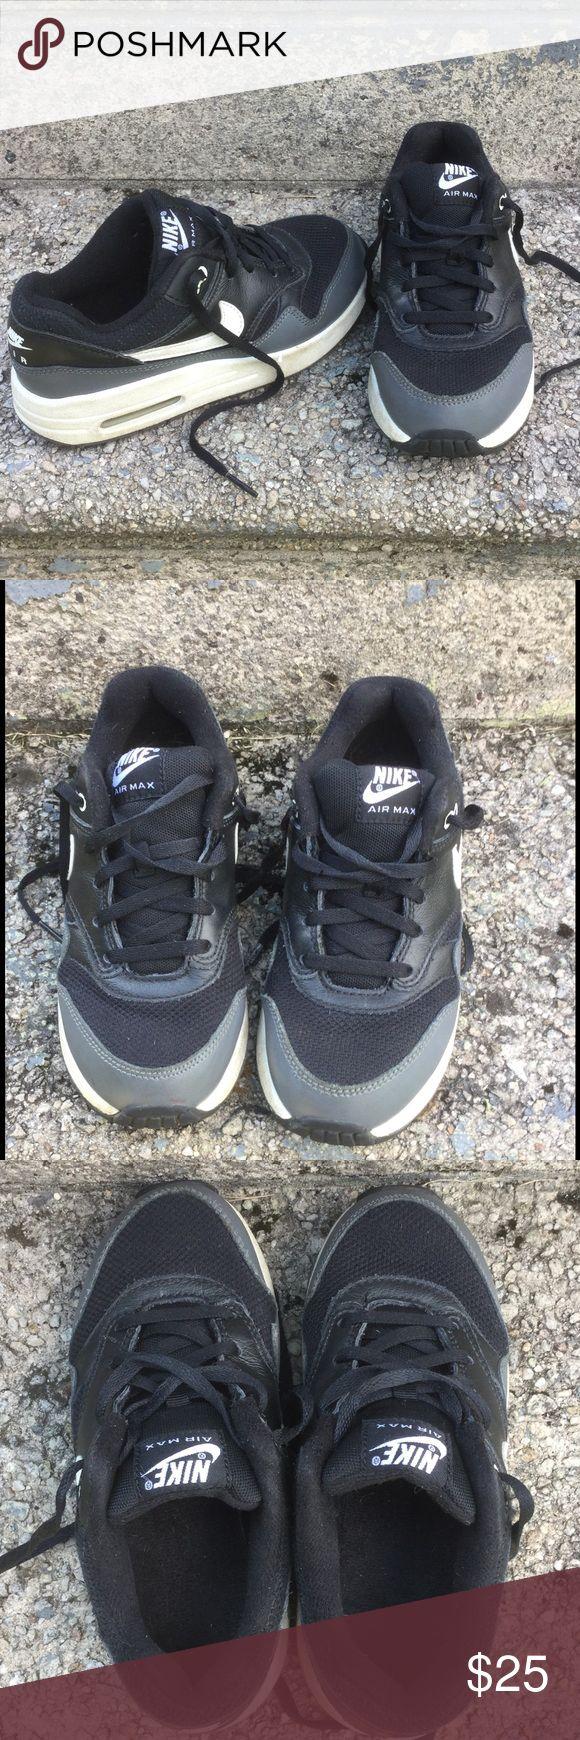 Boy's Nike Air Max sneakers Black Nike Air Max sneakers!  Good used shape!  Size 1Y Nike Shoes Sneakers